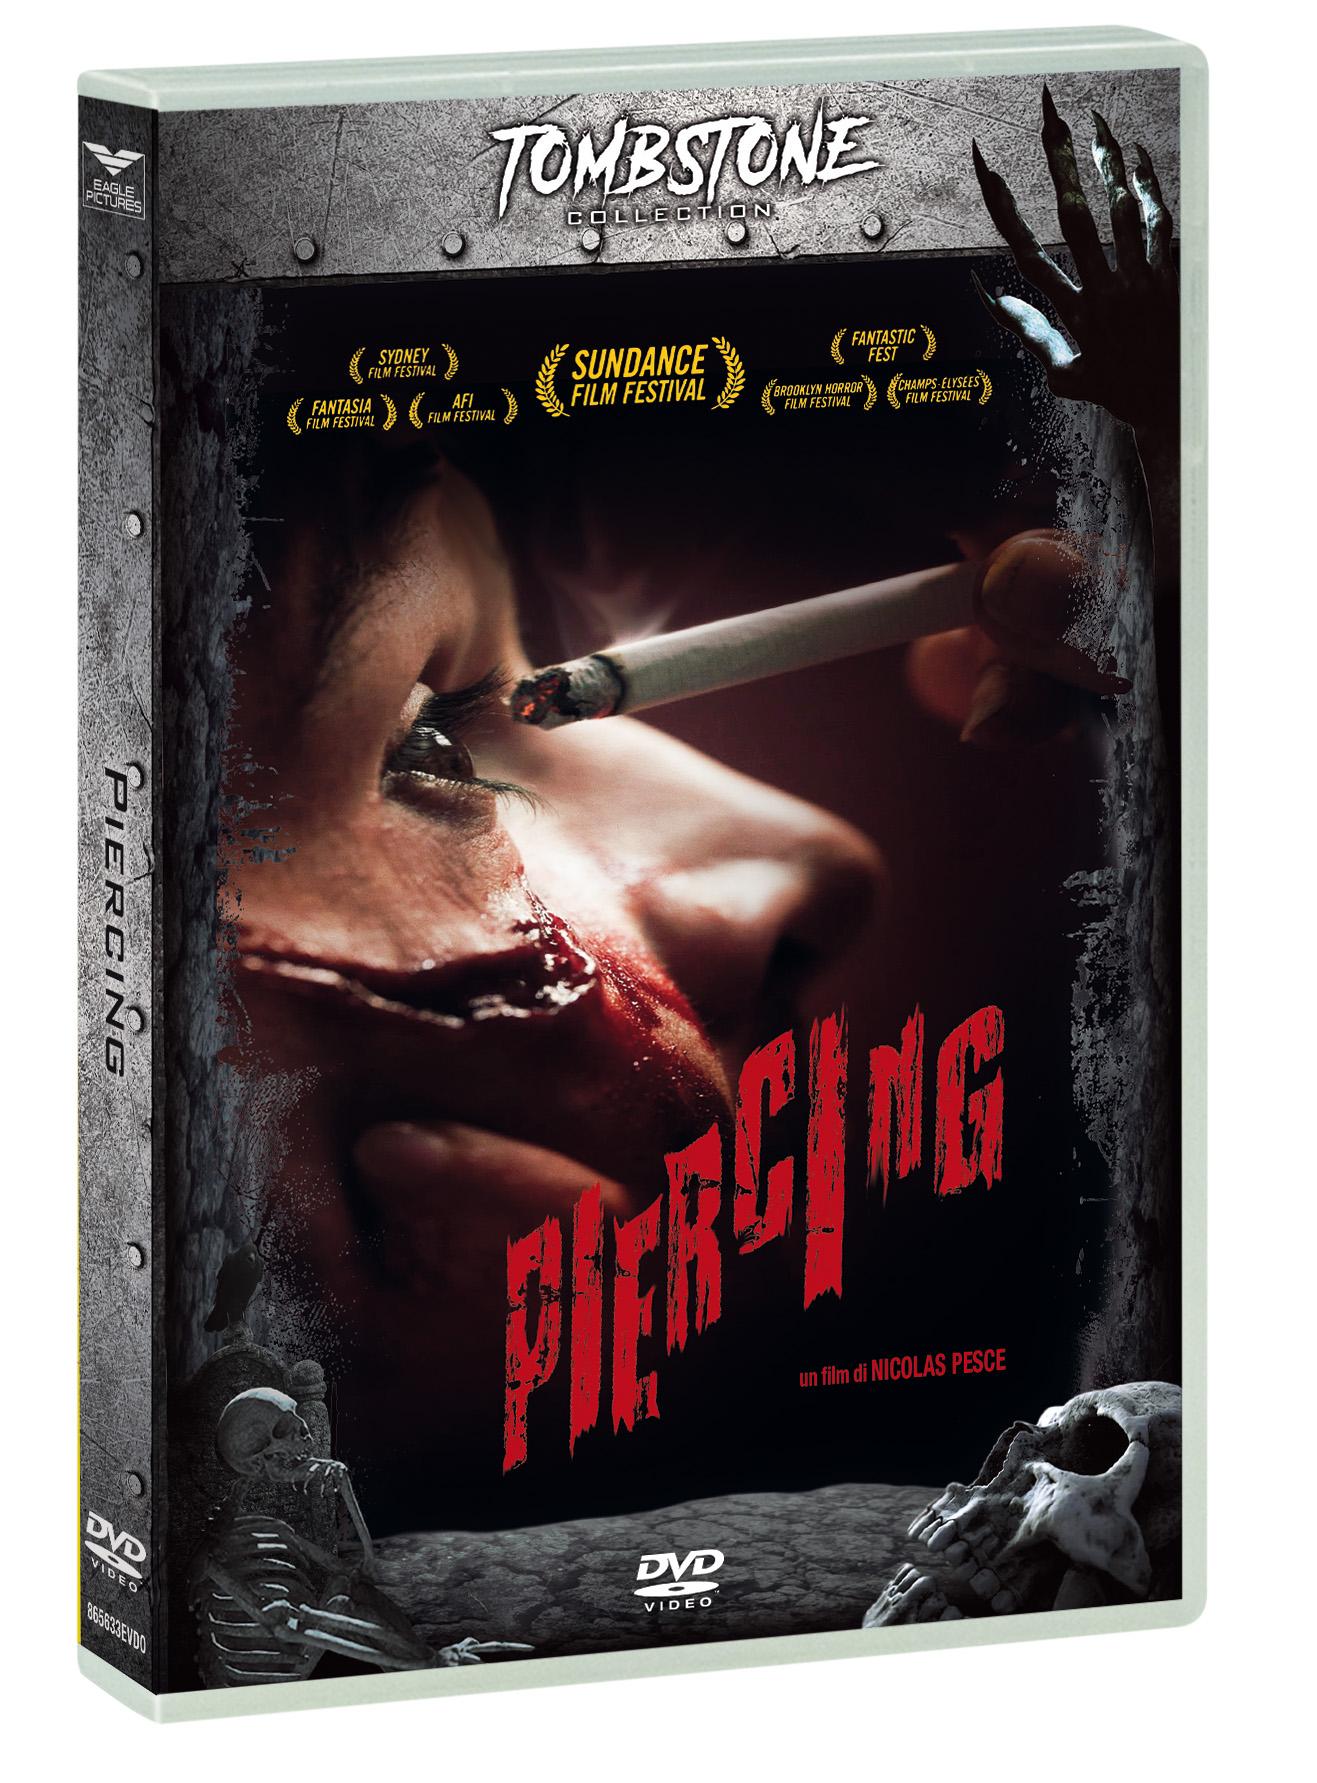 PIERCING (DVD+CARD TAROCCO) (TOMBSTONE) (DVD)